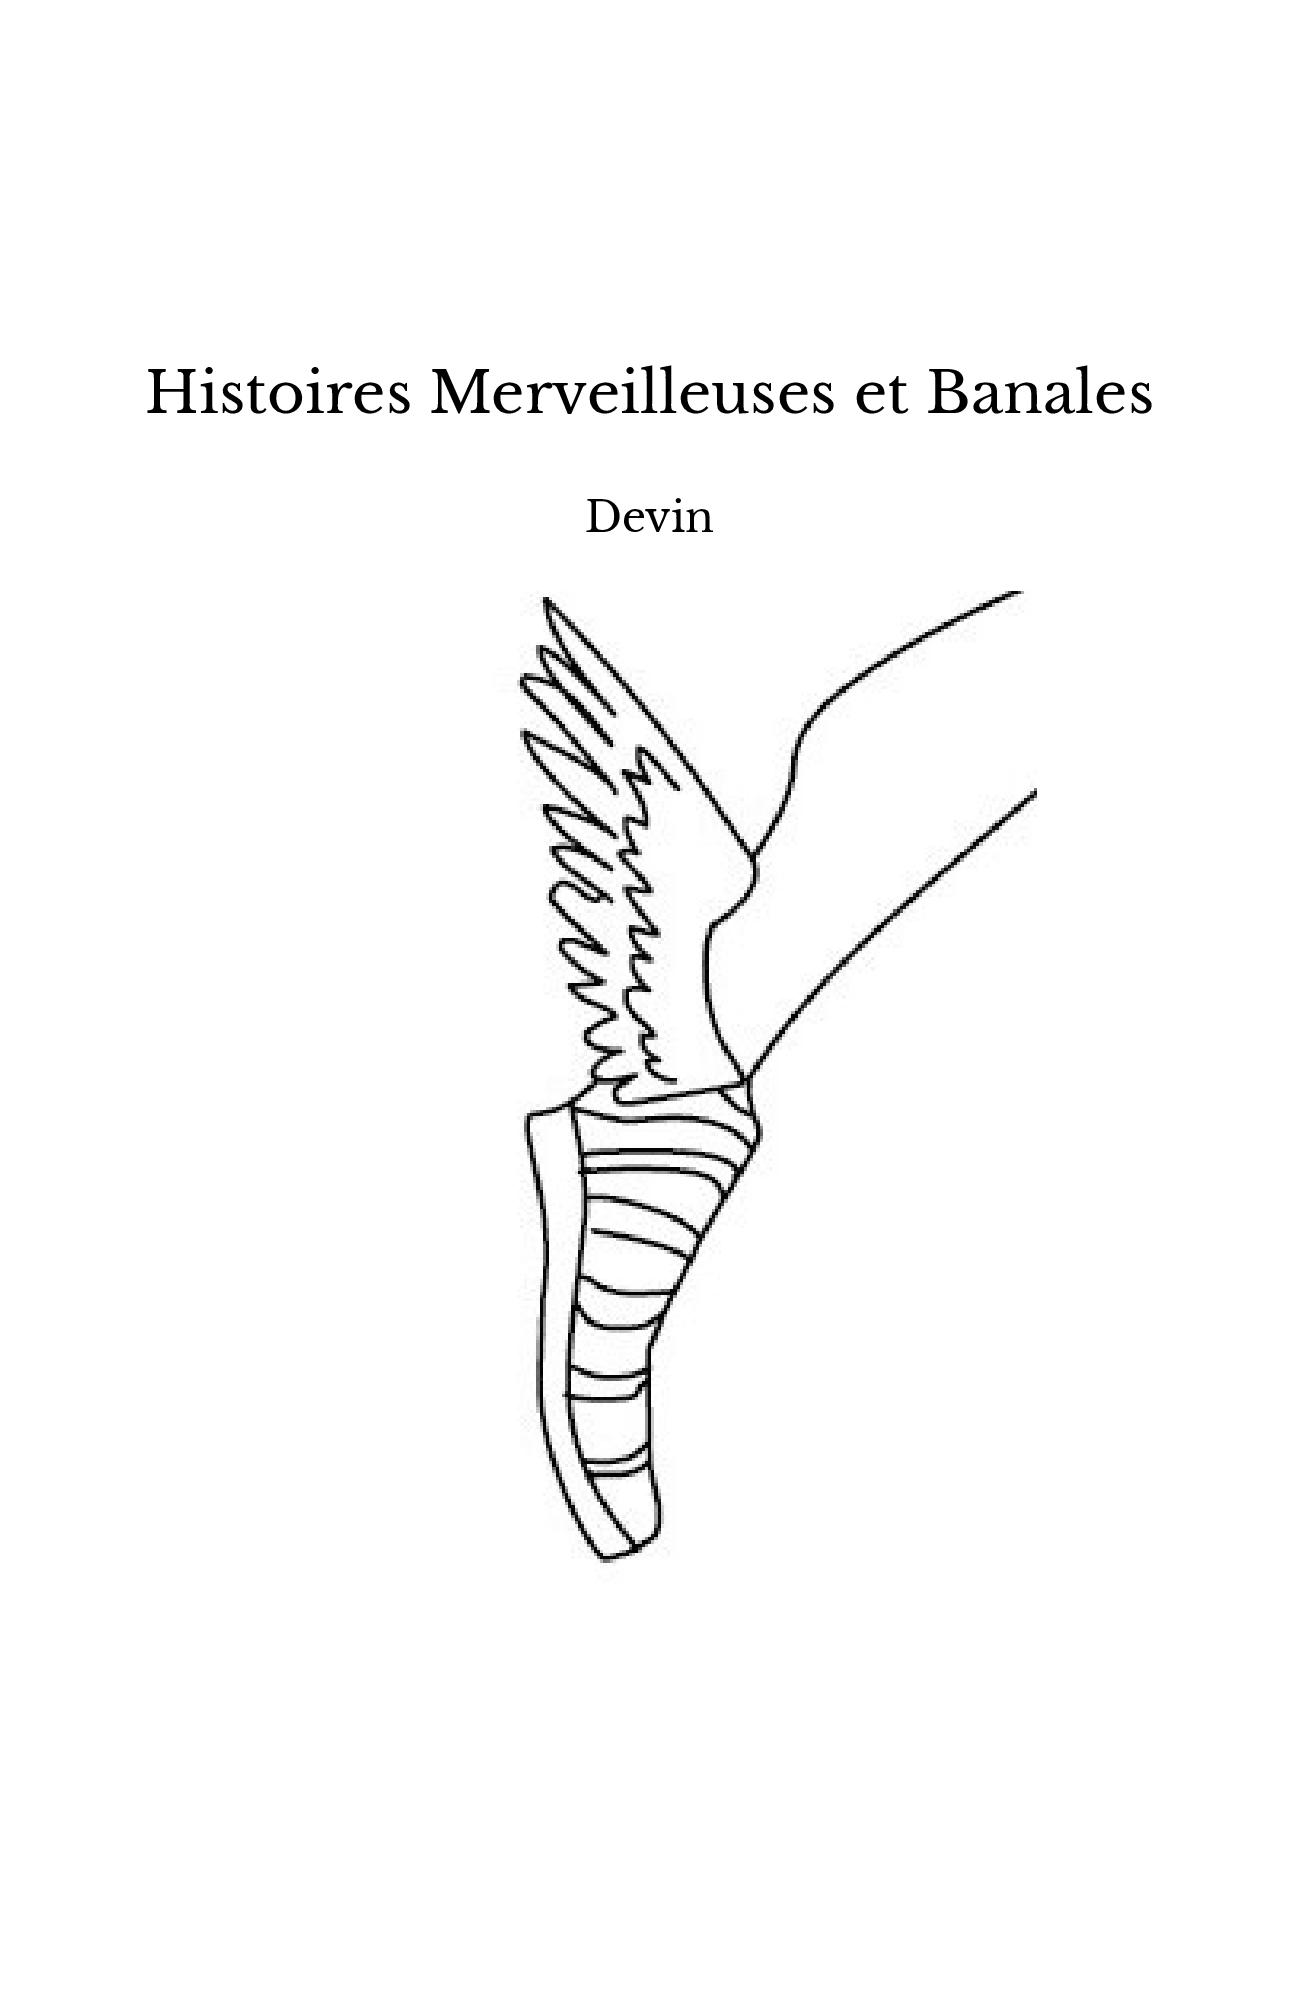 Histoires Merveilleuses et Banales